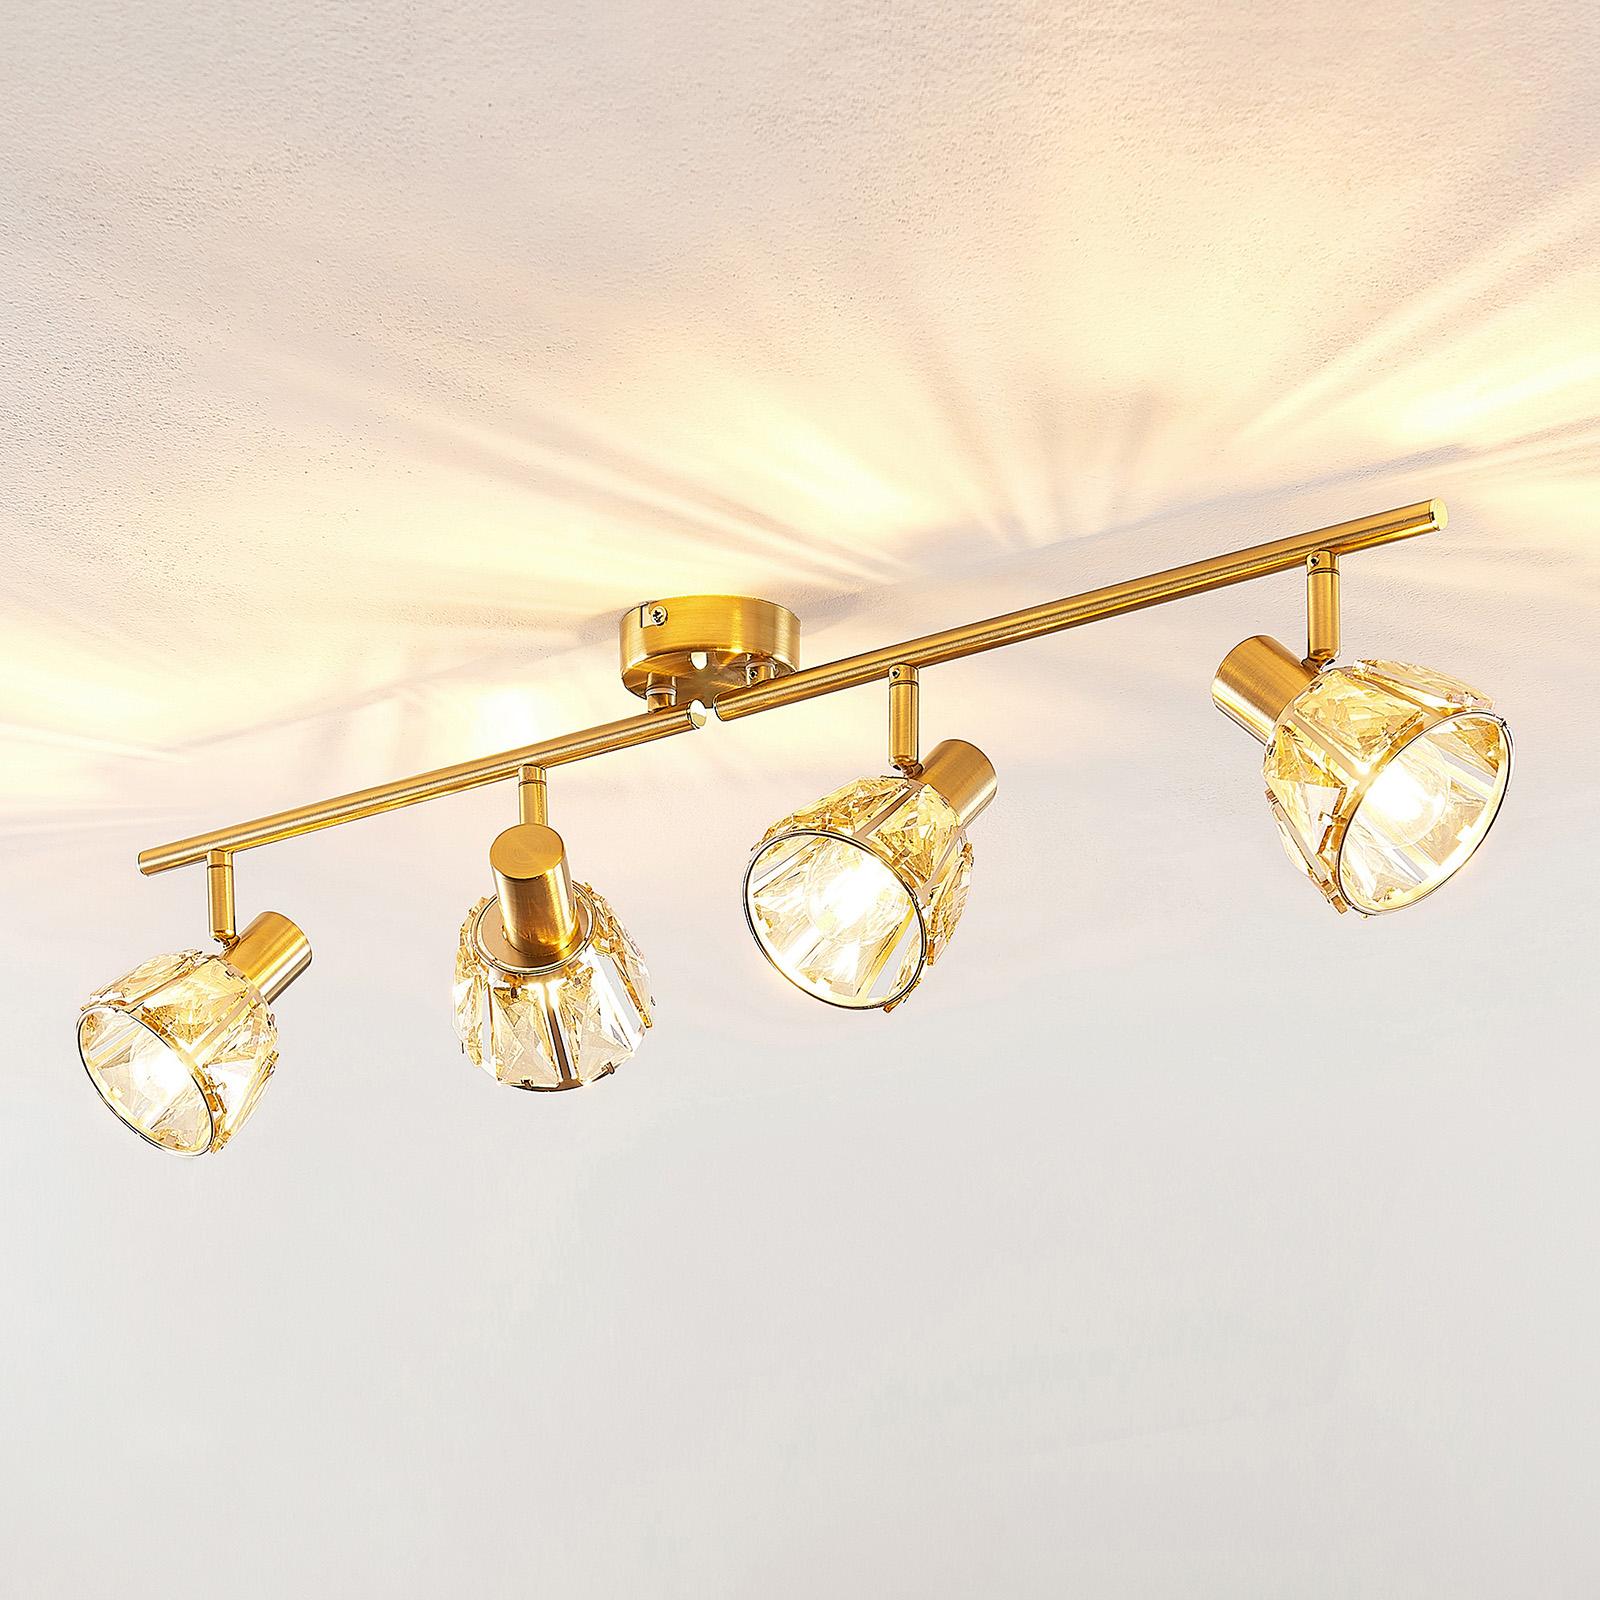 Lindby Kosta plafonnier, à 4 lampes, laiton